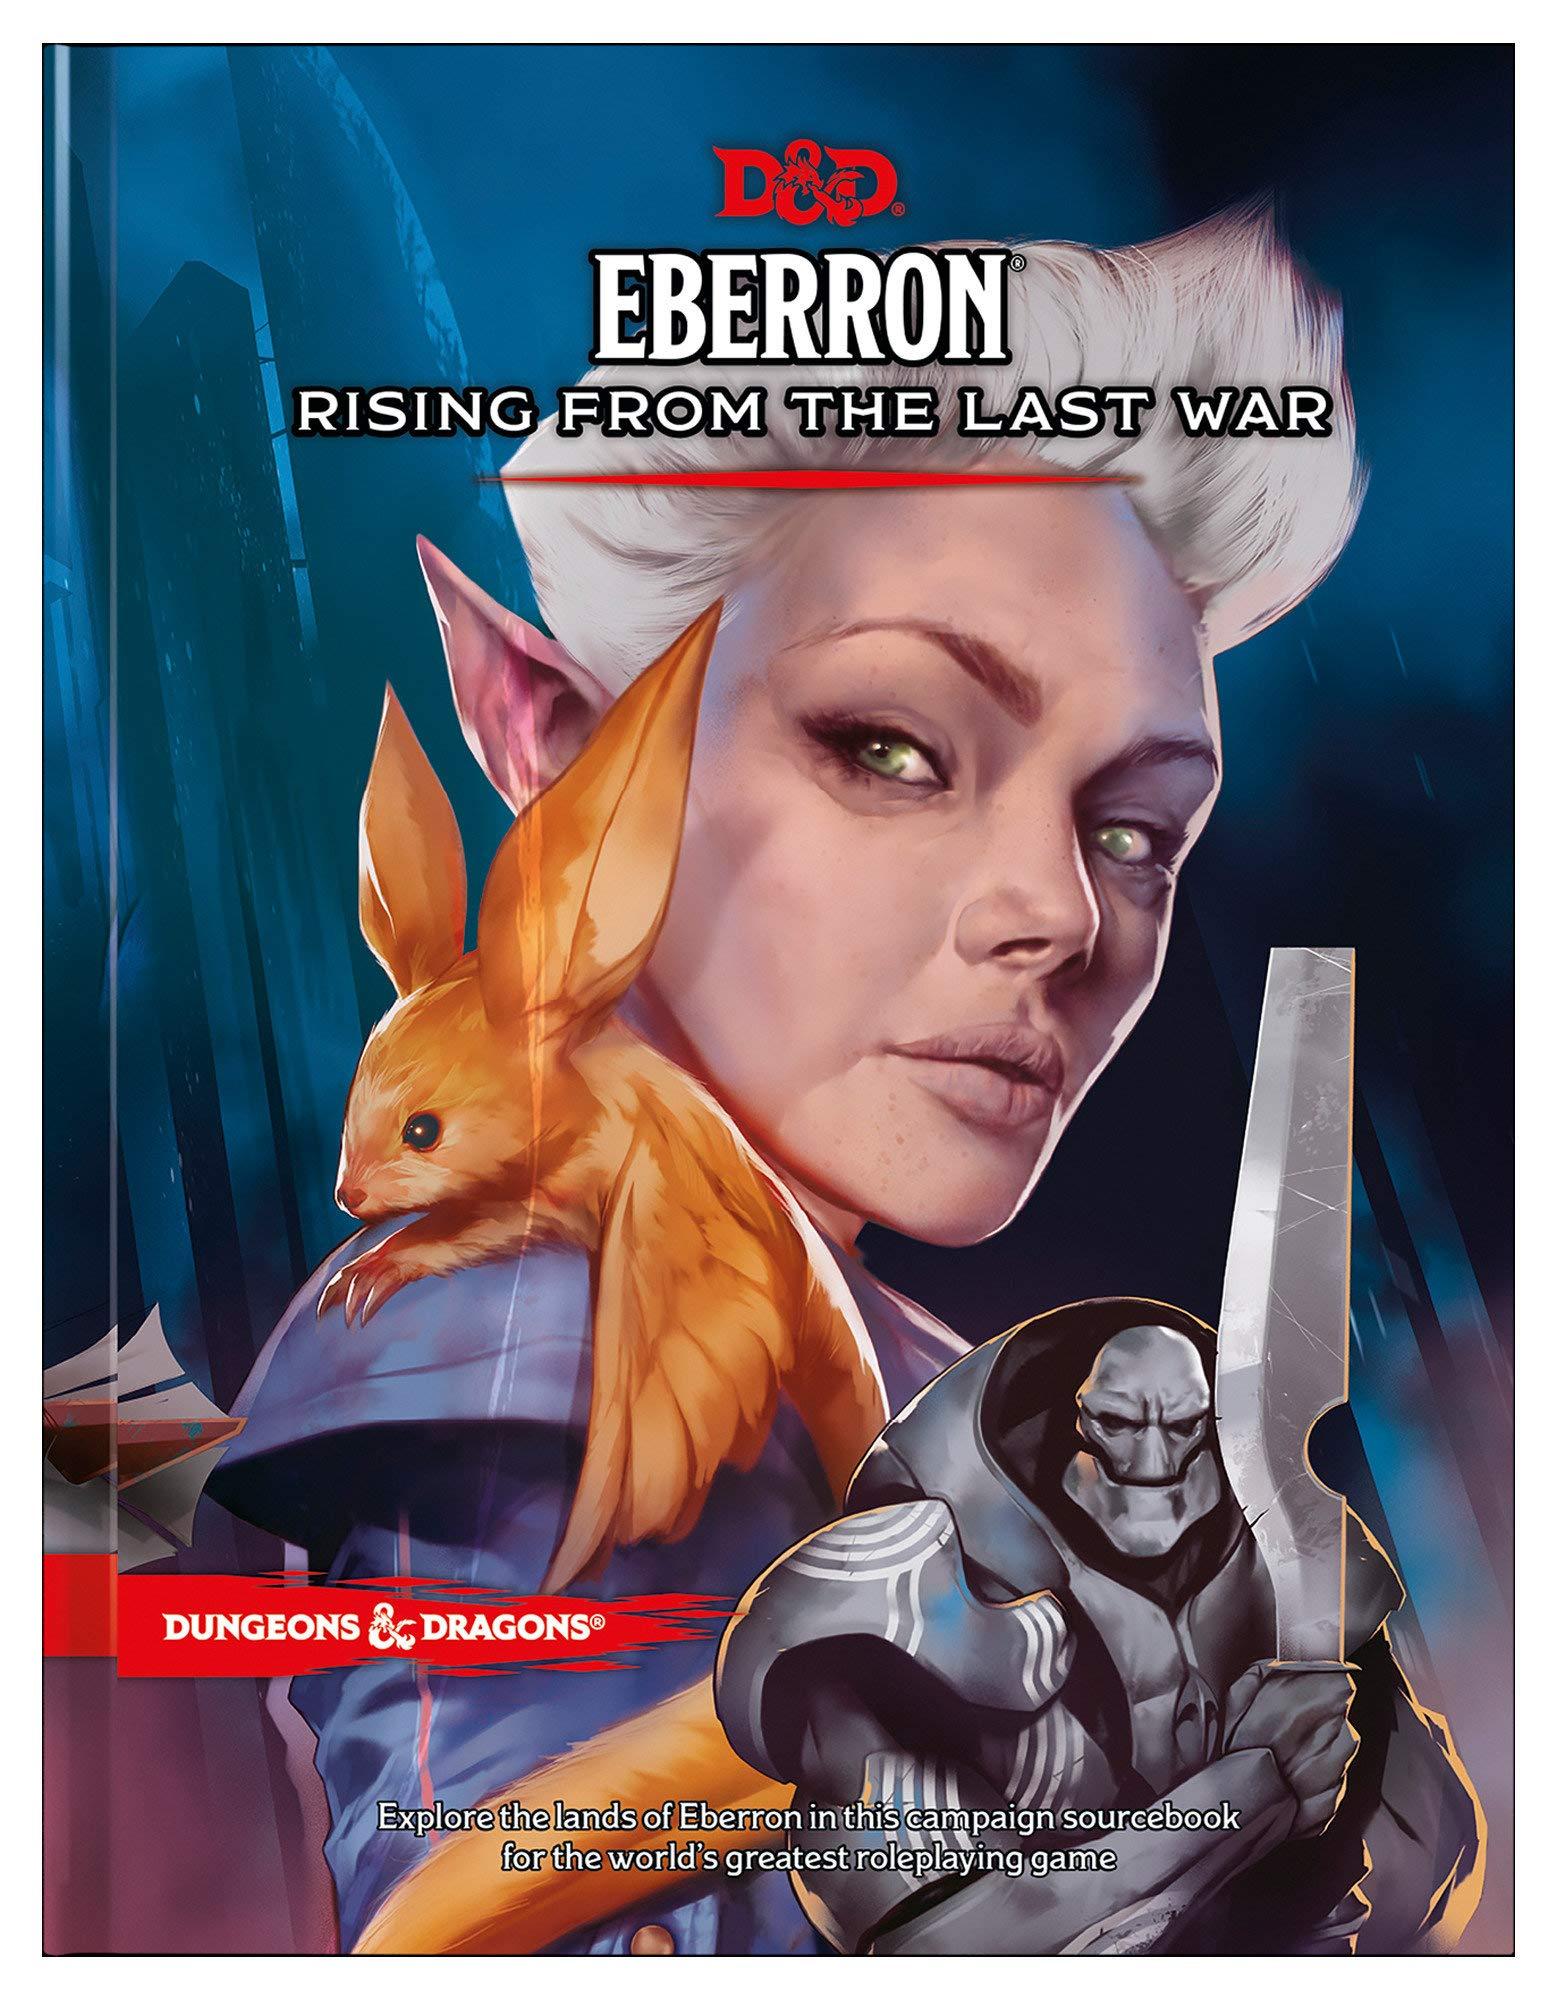 Eberron-Rising-from-the-Last-War.jpg